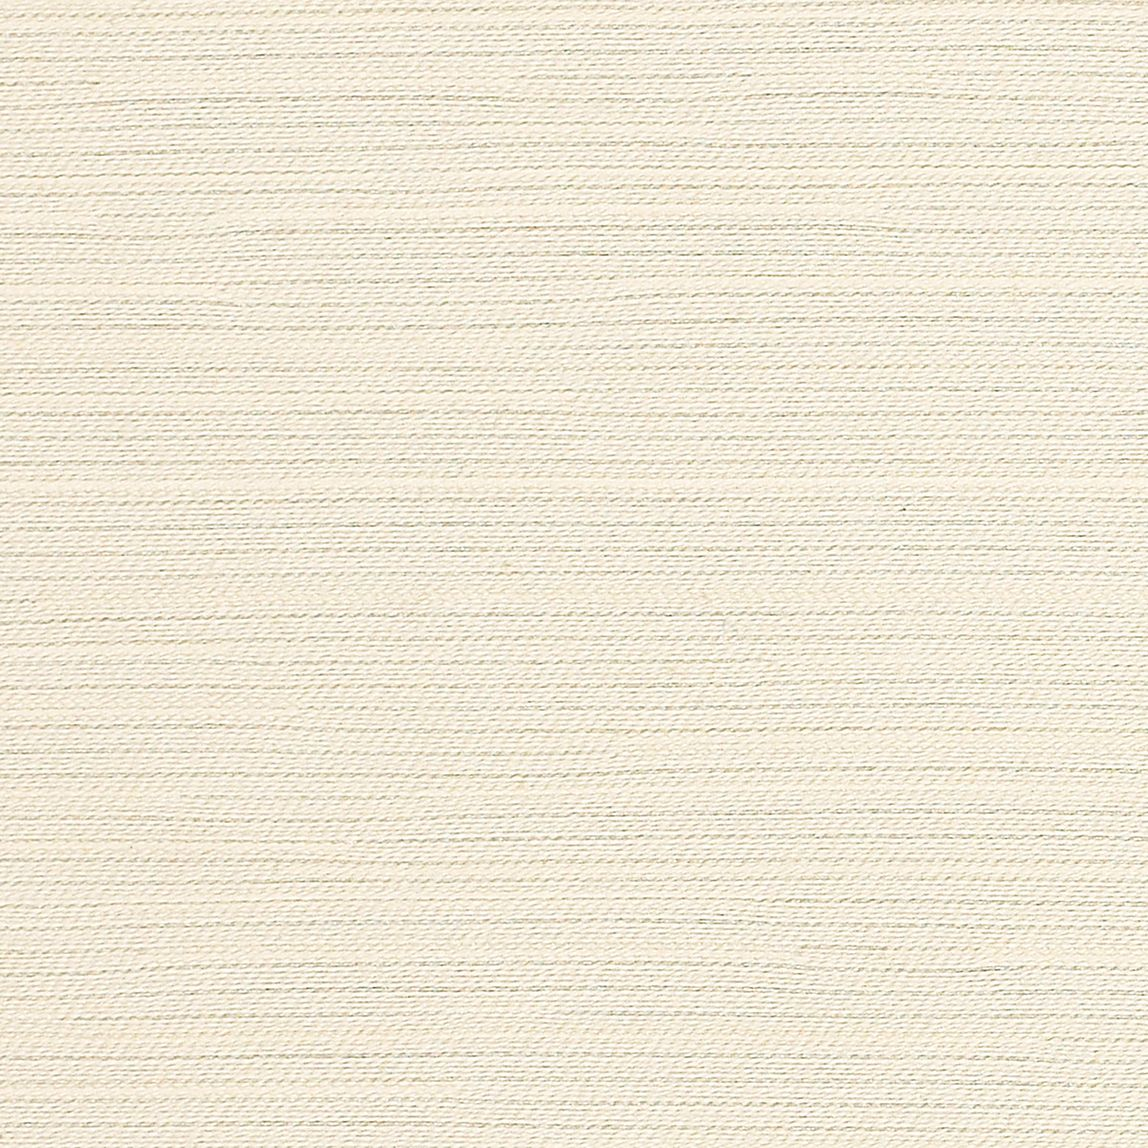 Weaving Palettes Alabaster Swatch